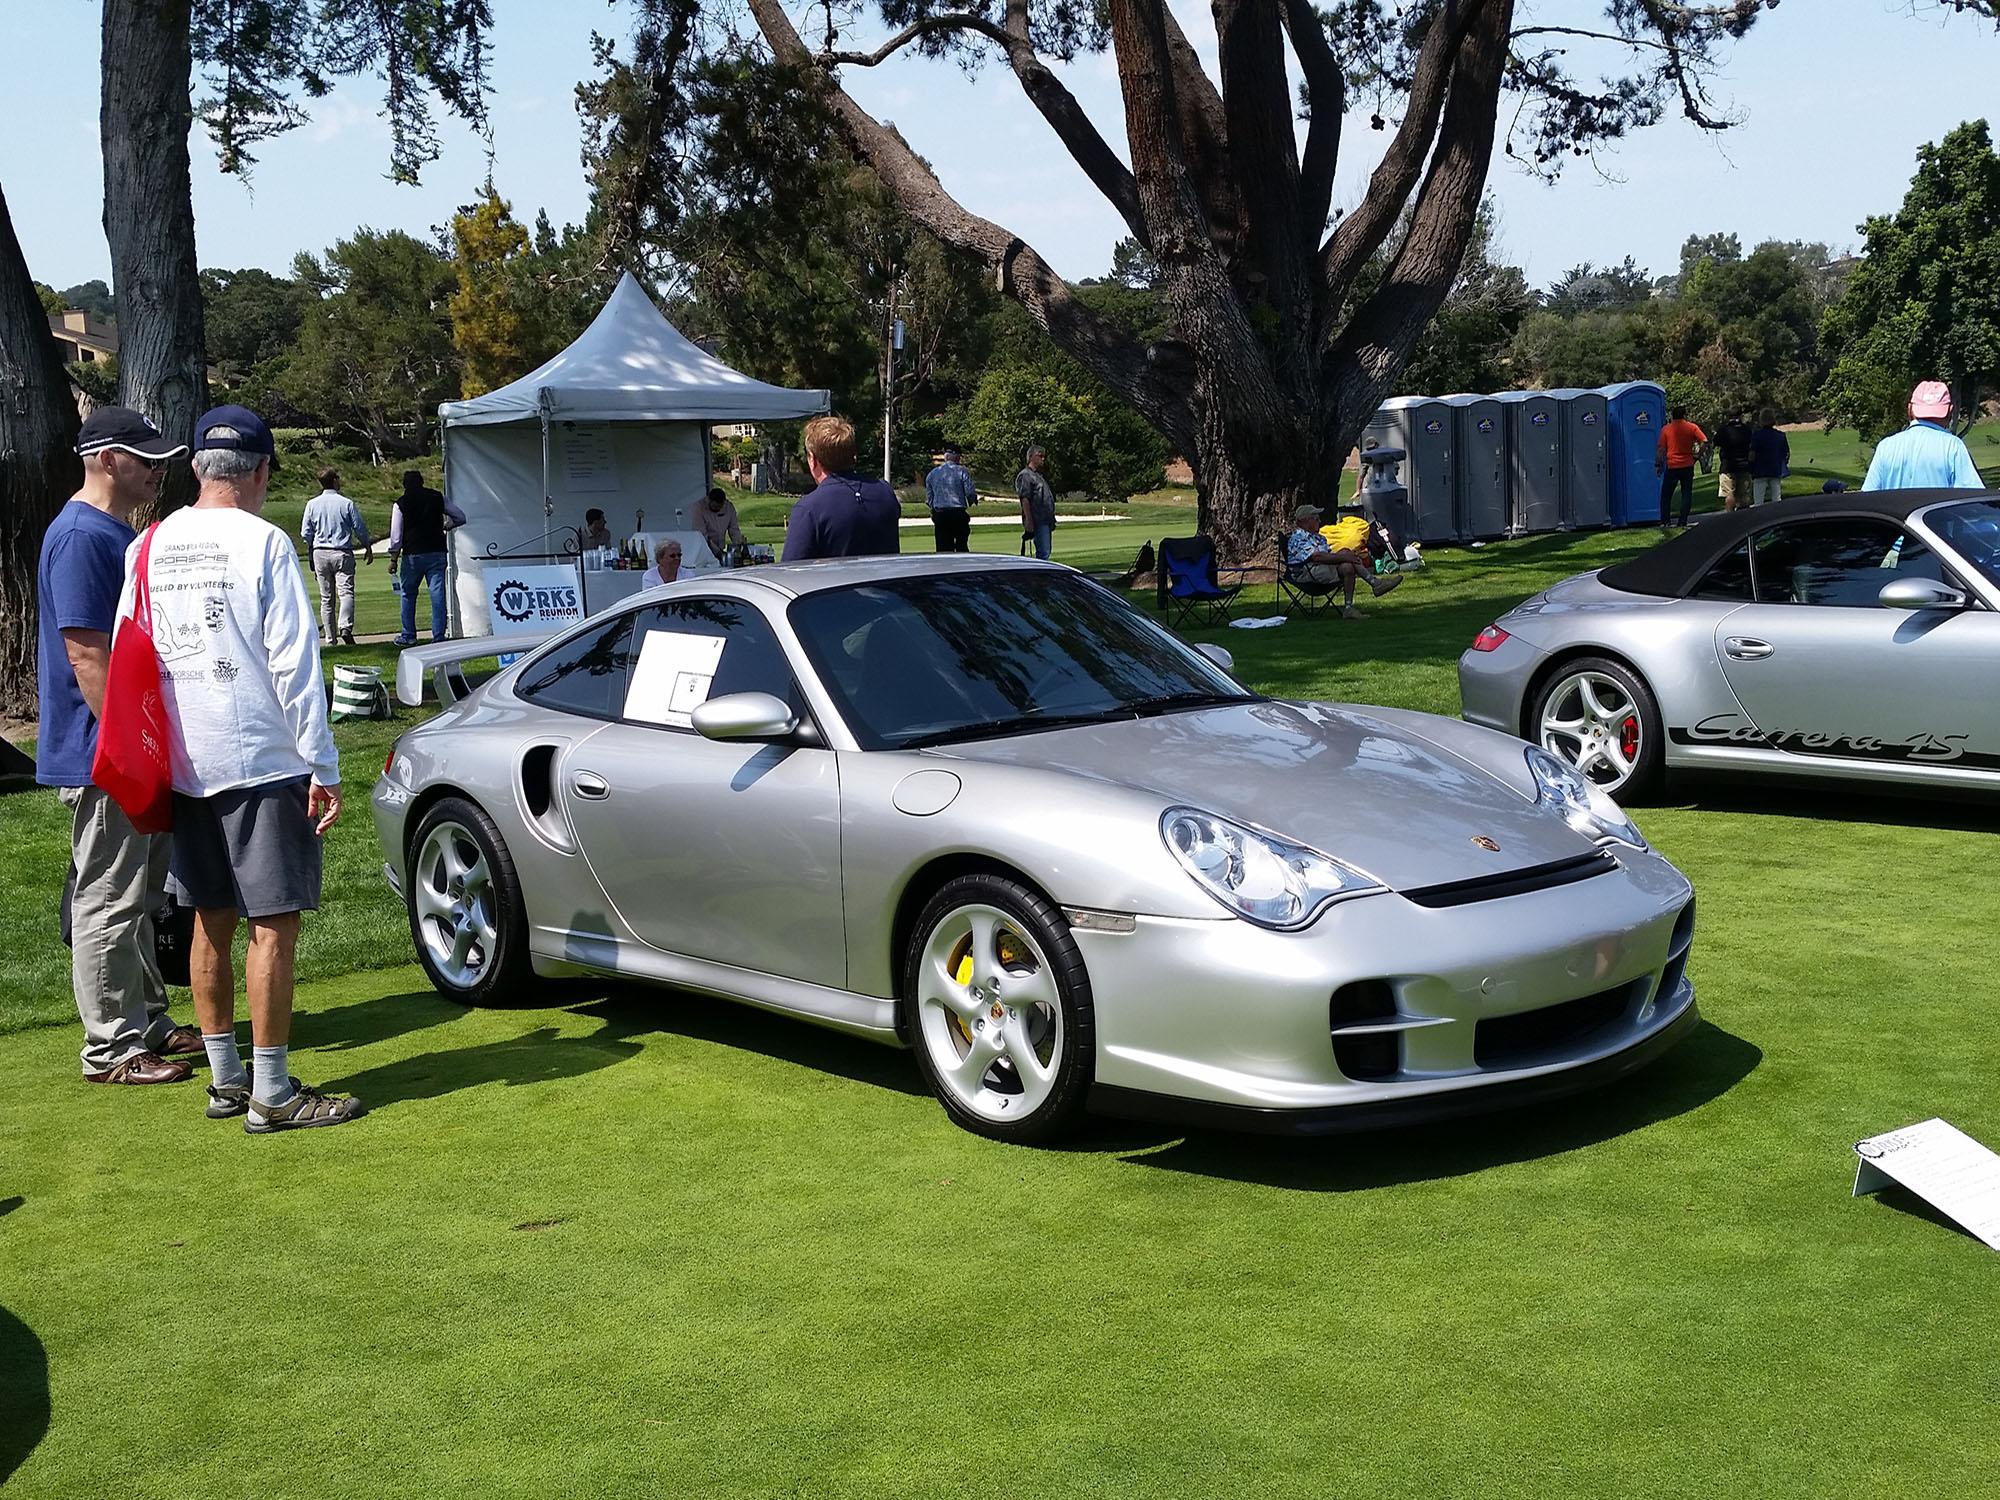 996 Porsche 911 Turbo Coupe